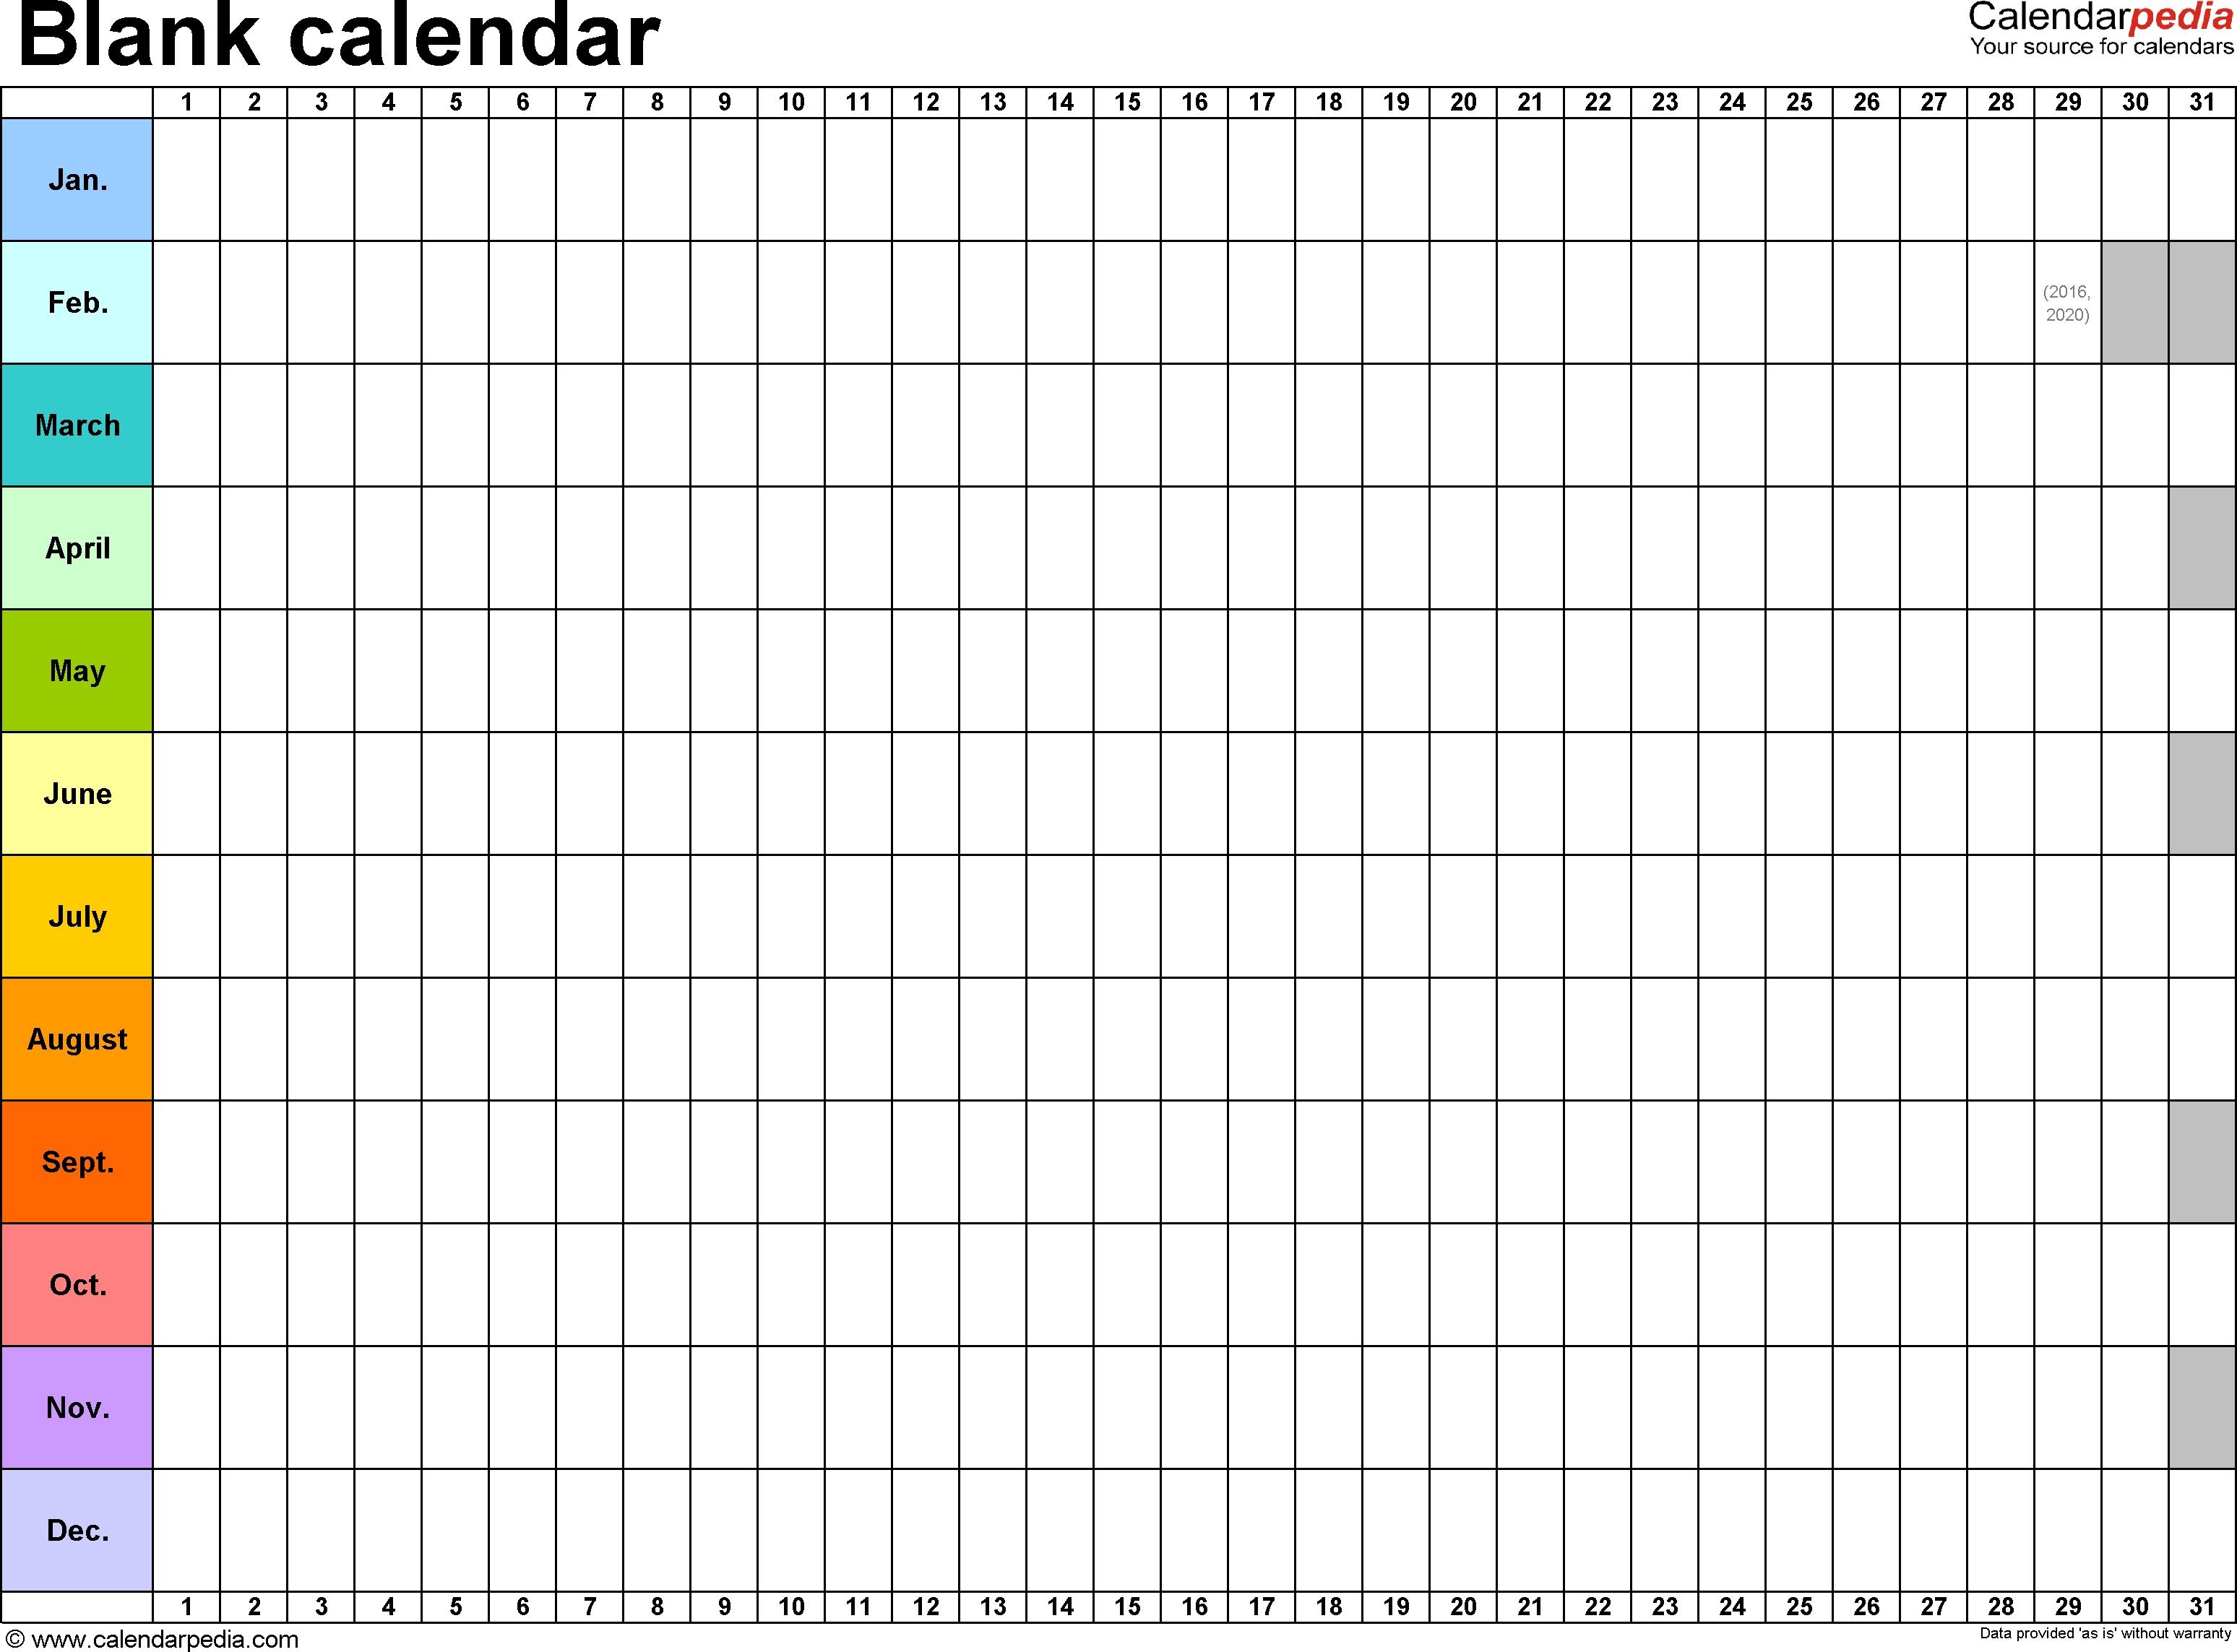 Blank Calendar - 9 Free Printable Microsoft Word Templates-Blank Template For 30 Days